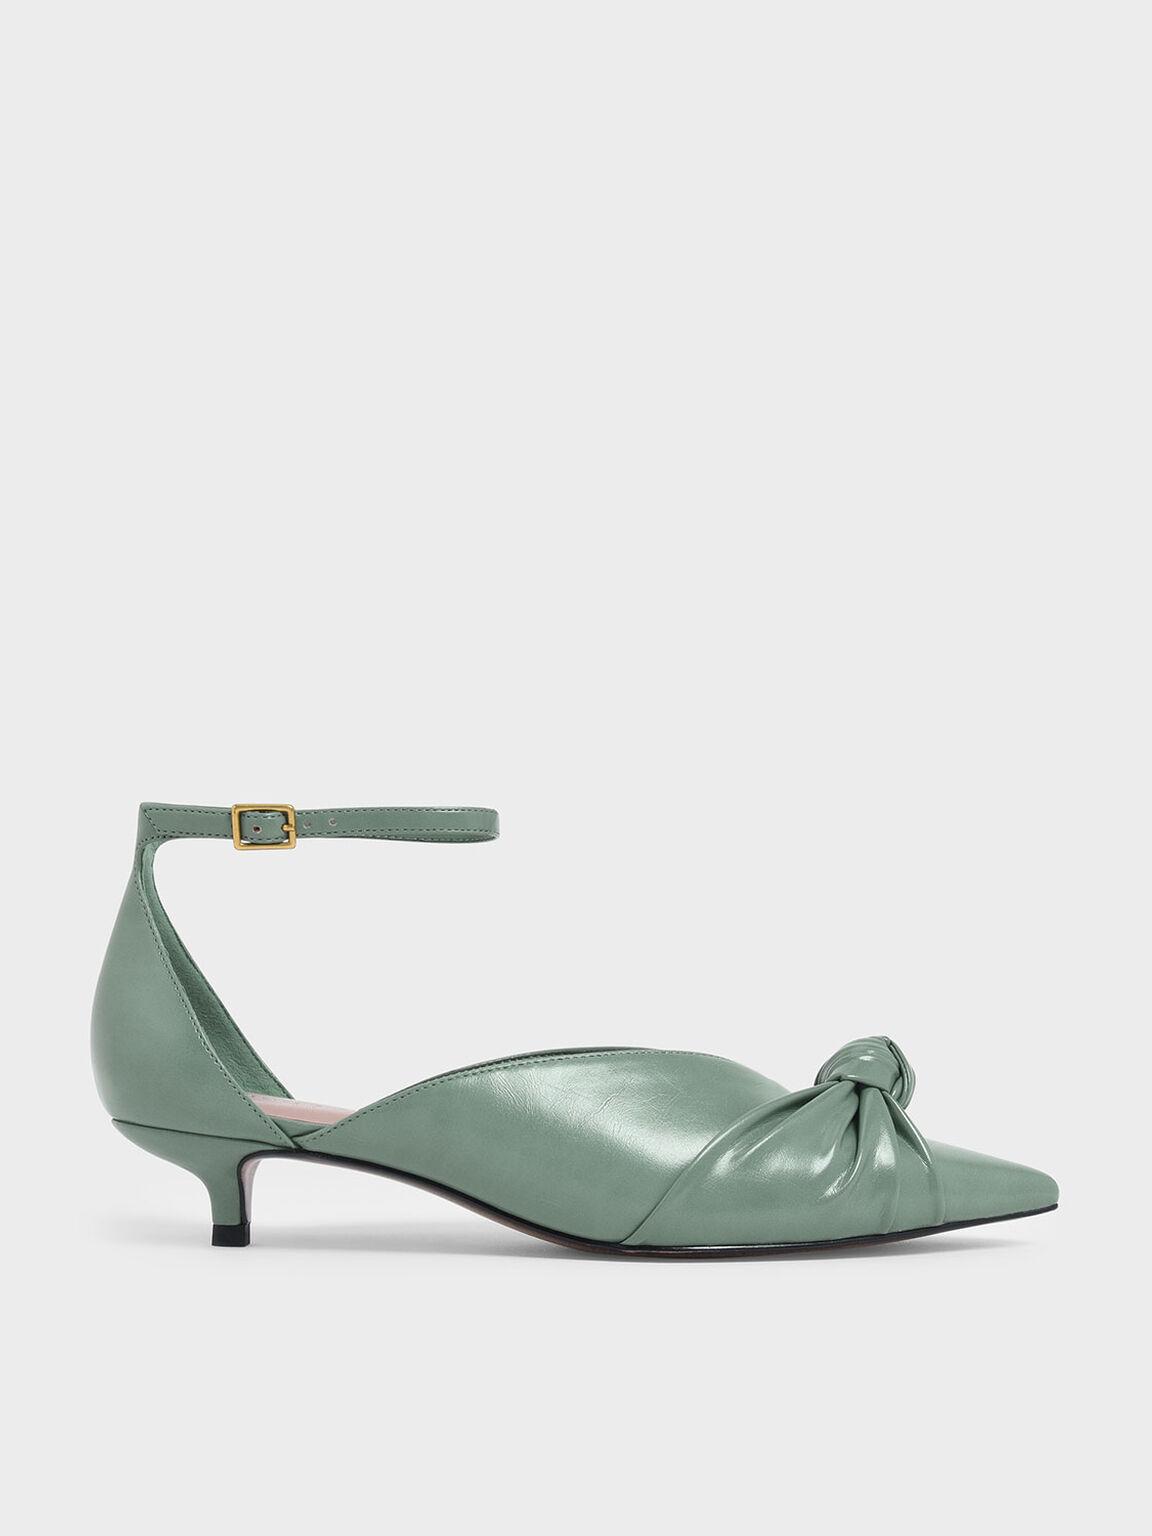 CHARLES & KEITH 鞋款低至34折優惠!:第15張圖片